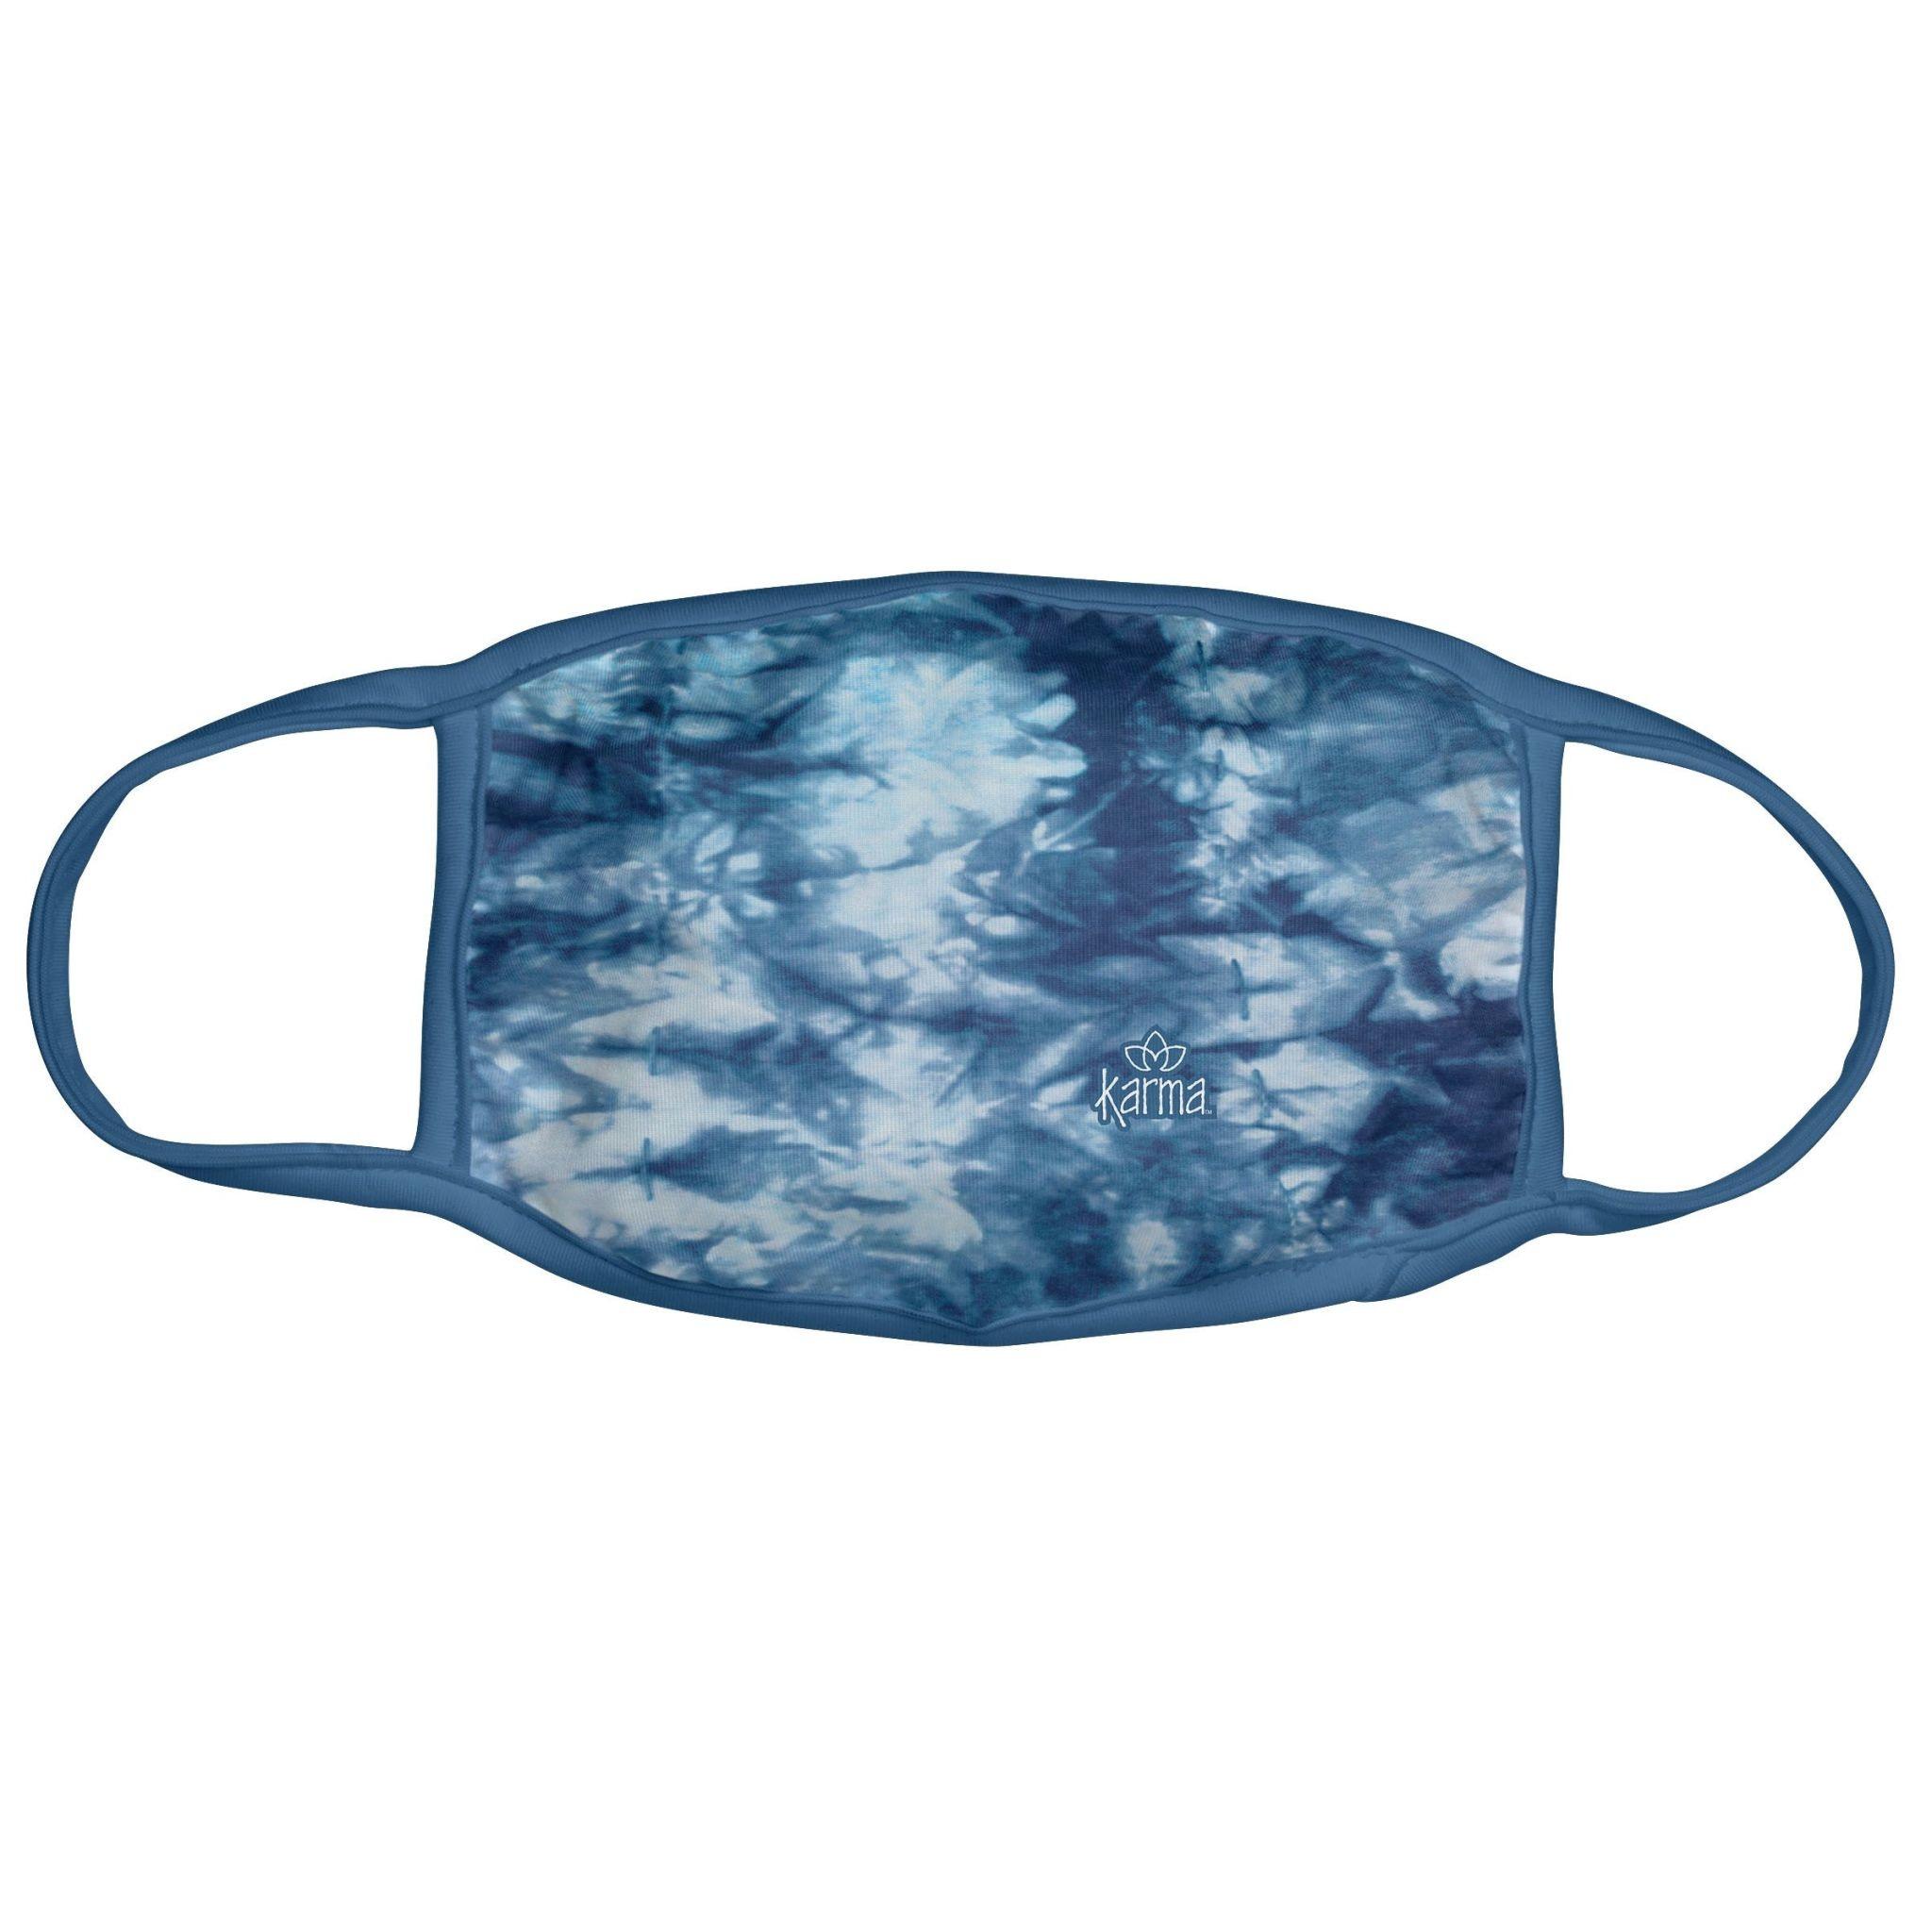 Karma Face Mask - Adult - Blue Tie Dye